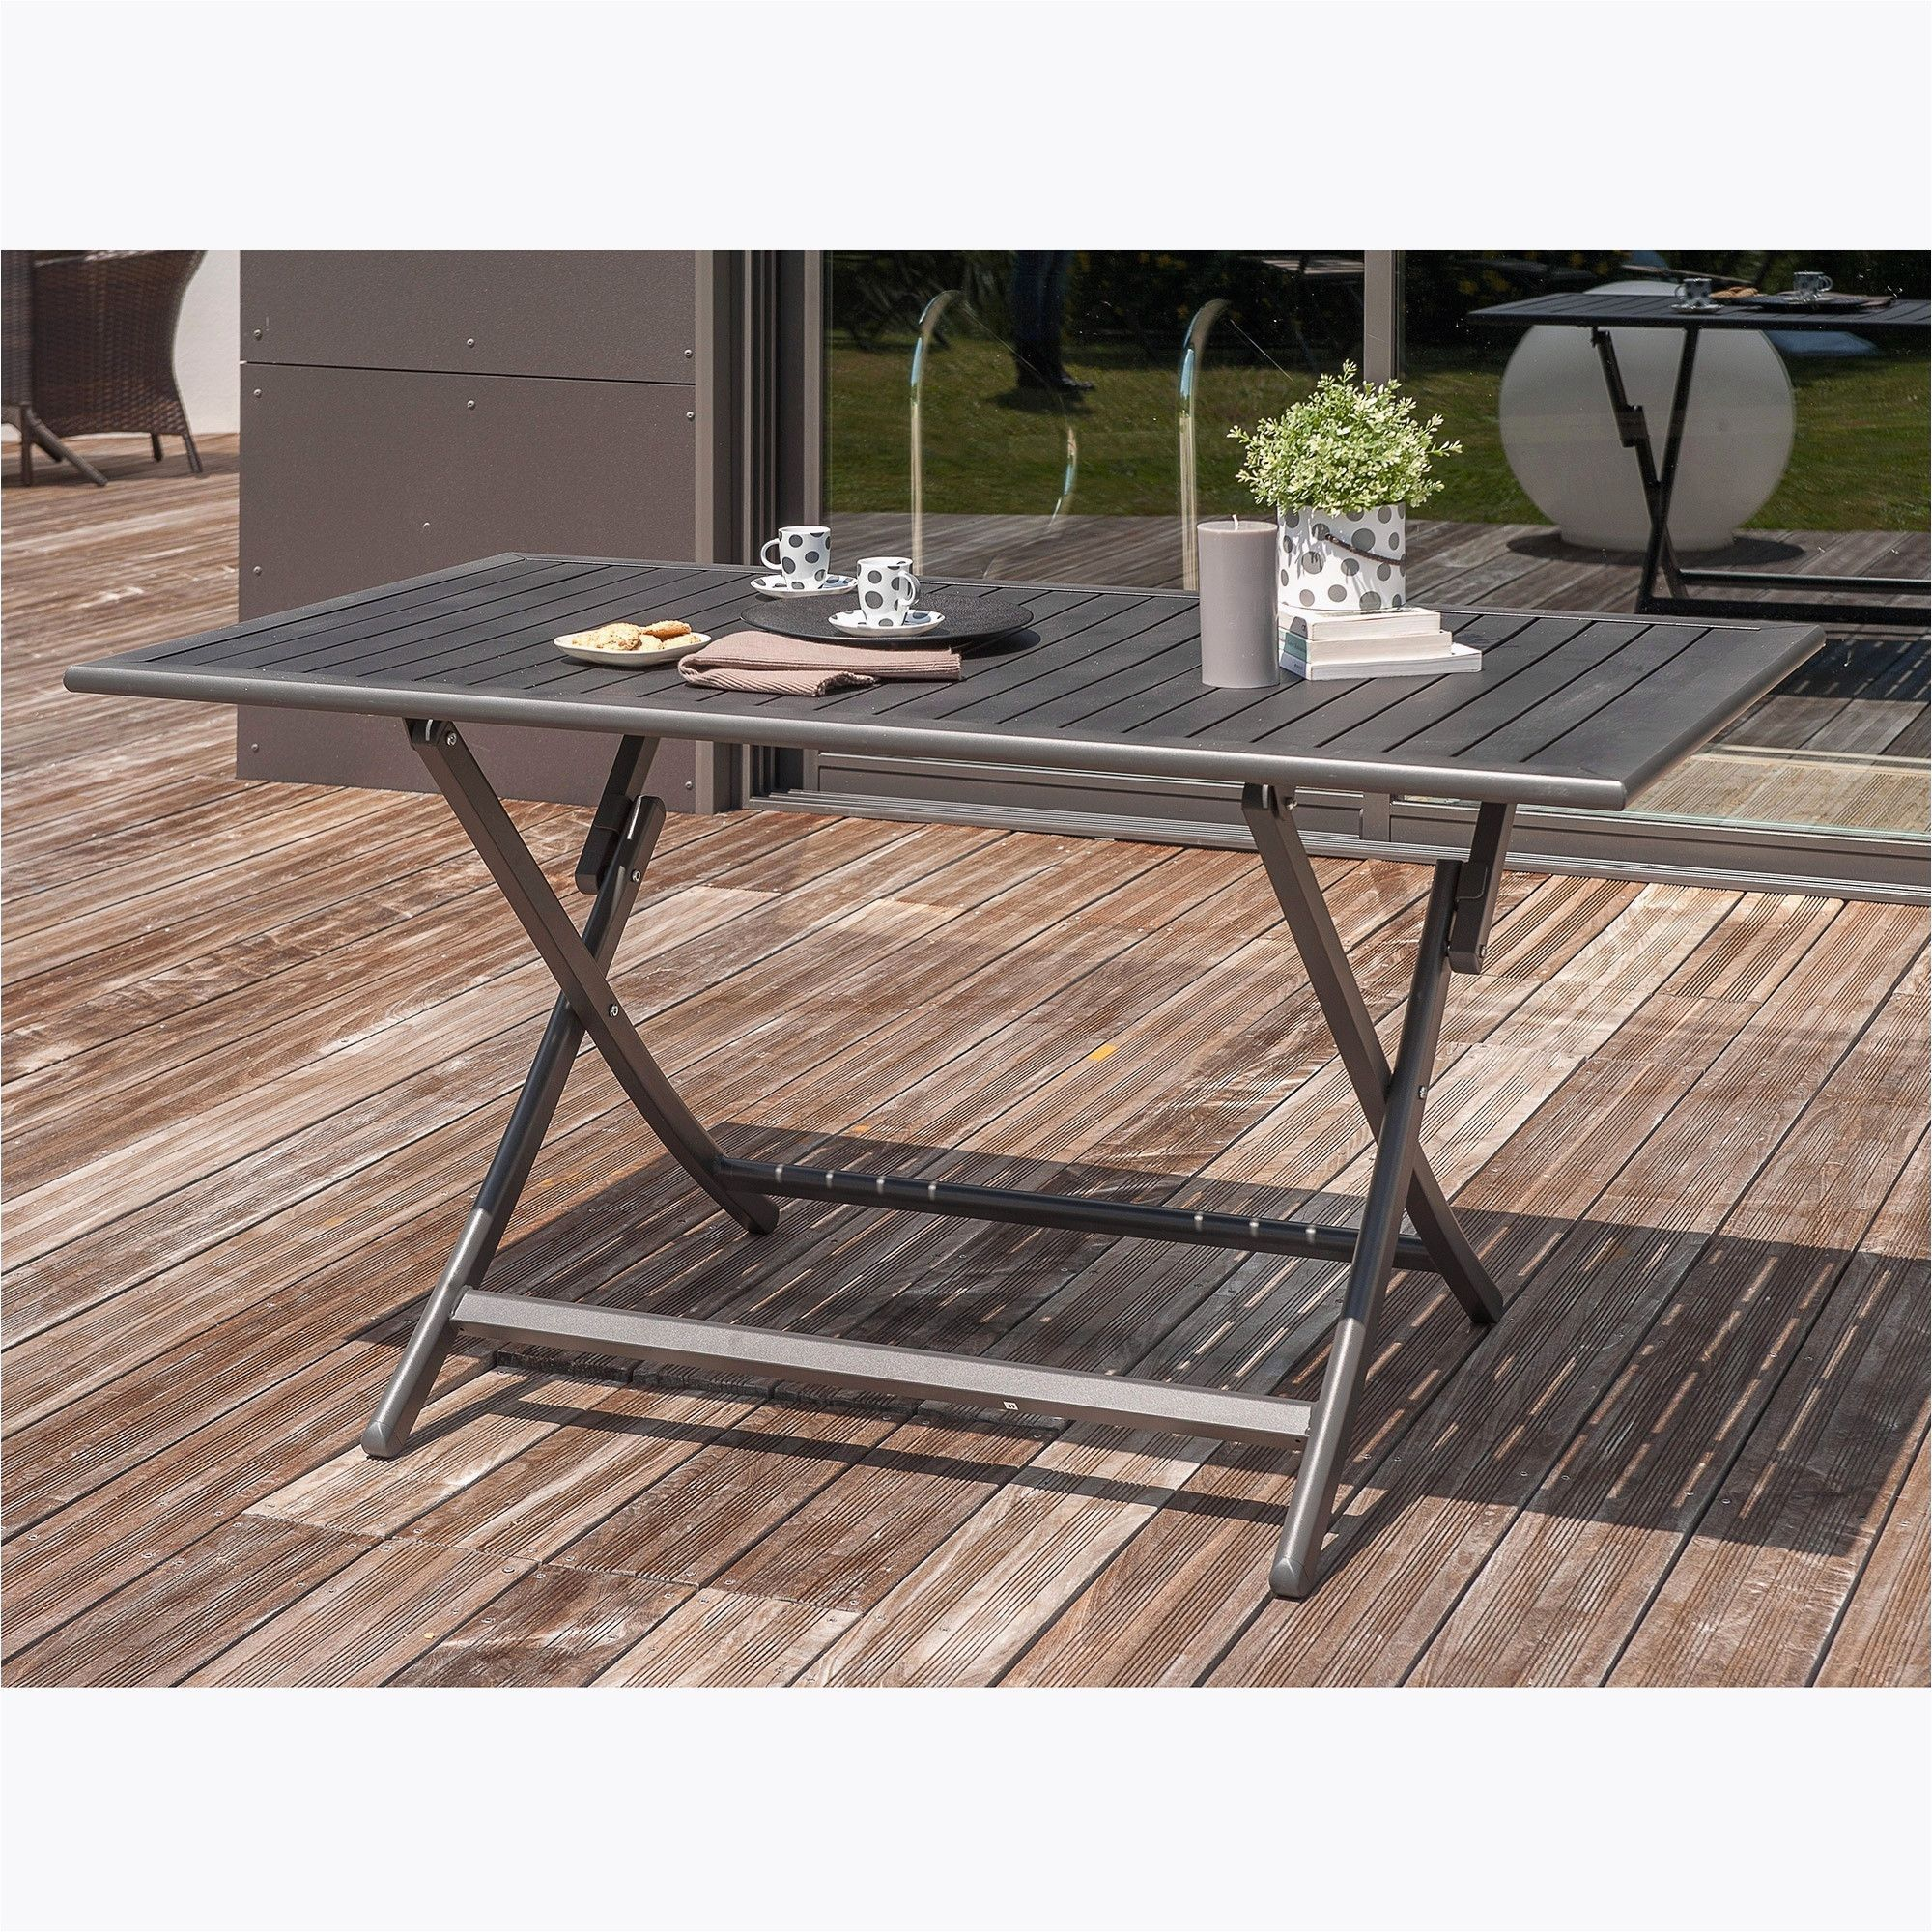 Table Teck Jardin Charmant Table Pliante Leclerc Beau S Leclerc Table De Jardin